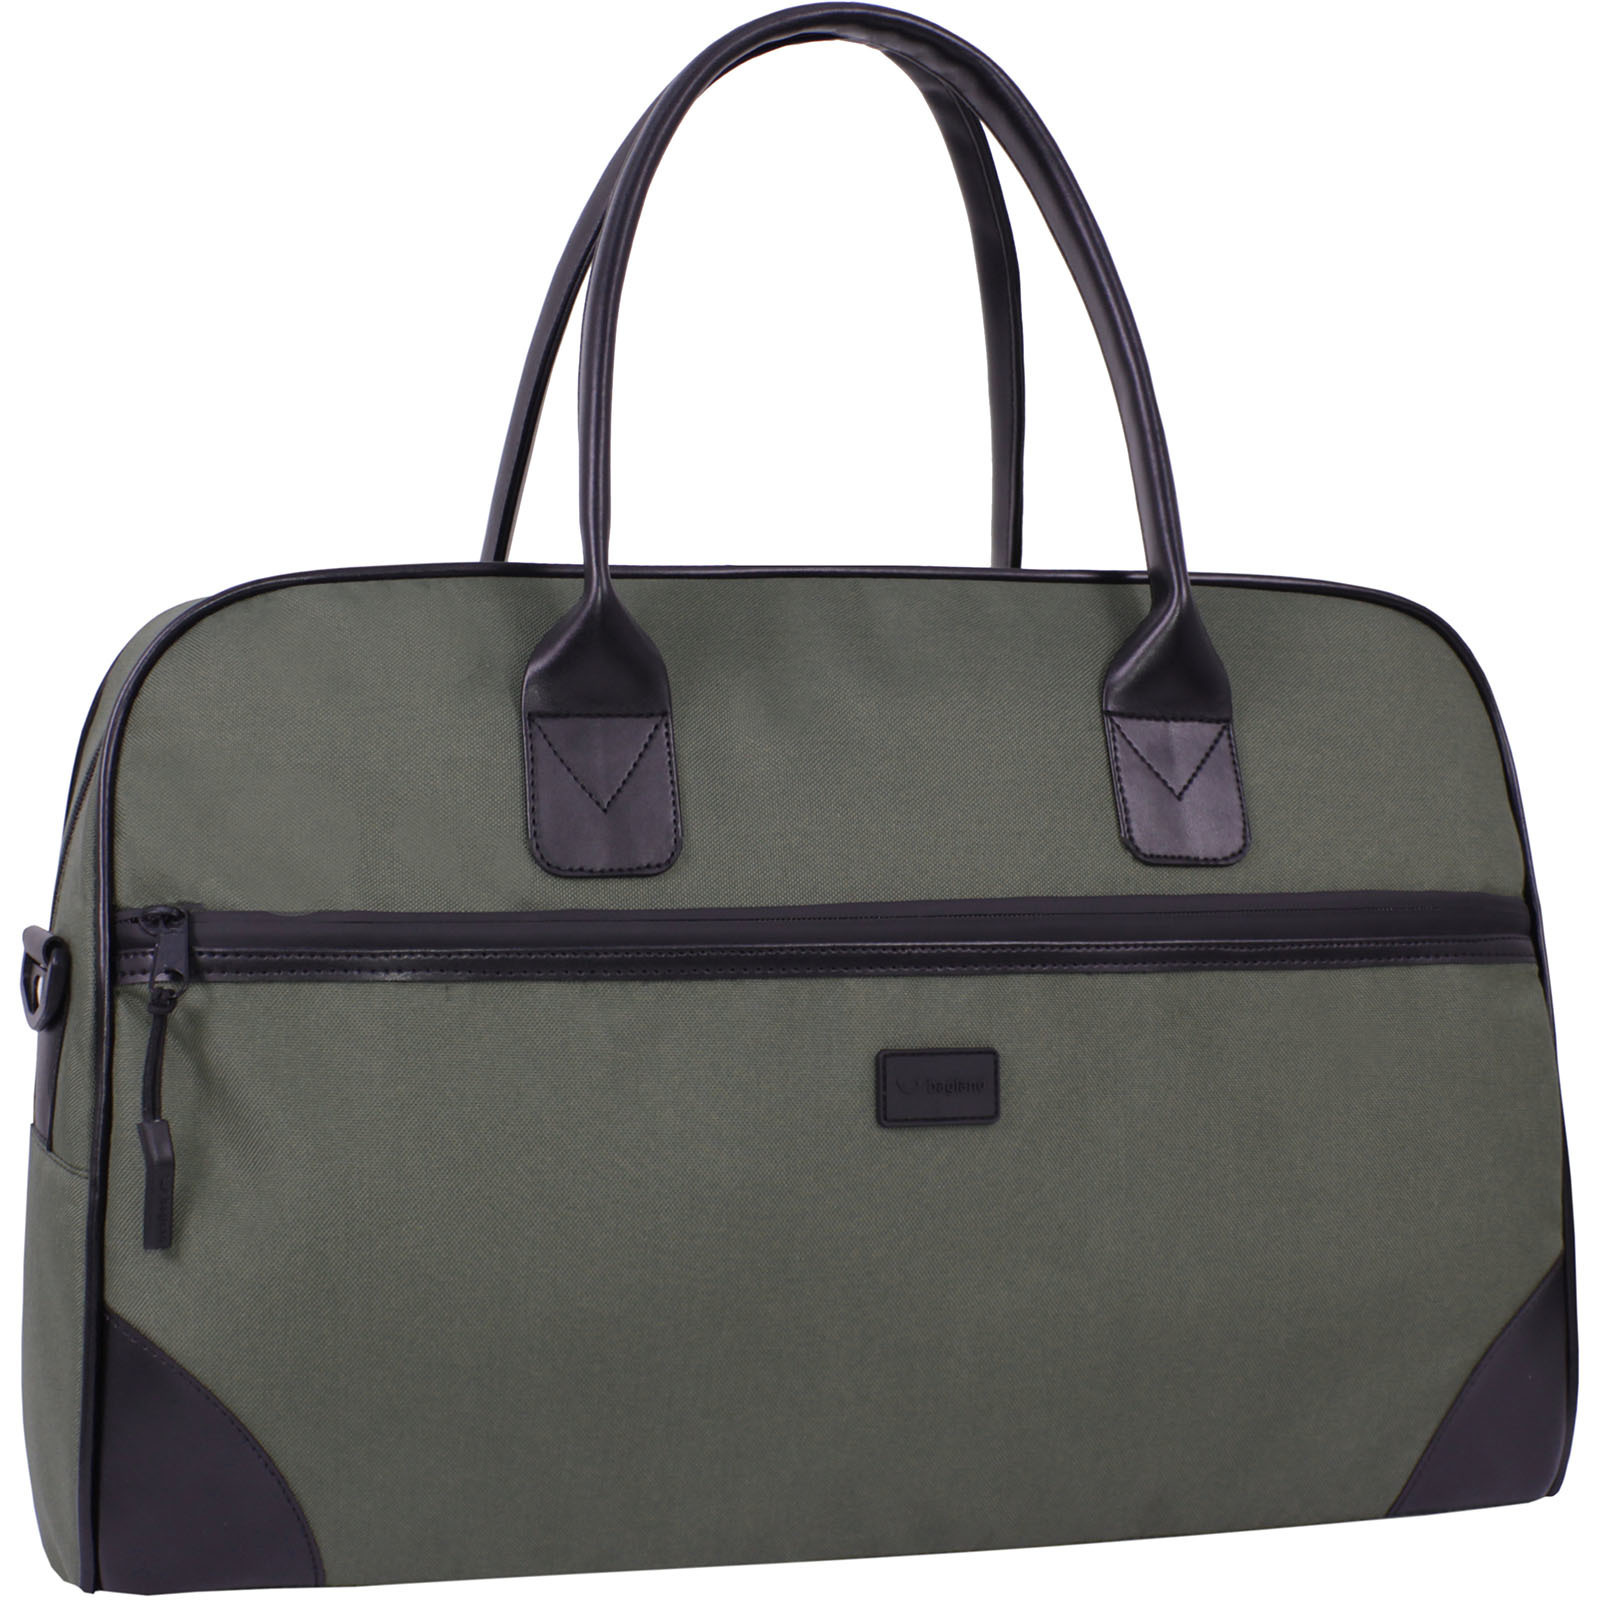 Дорожные сумки Сумка Bagland Infantino 36 л. Хаки (0033066) IMG_9321.JPG